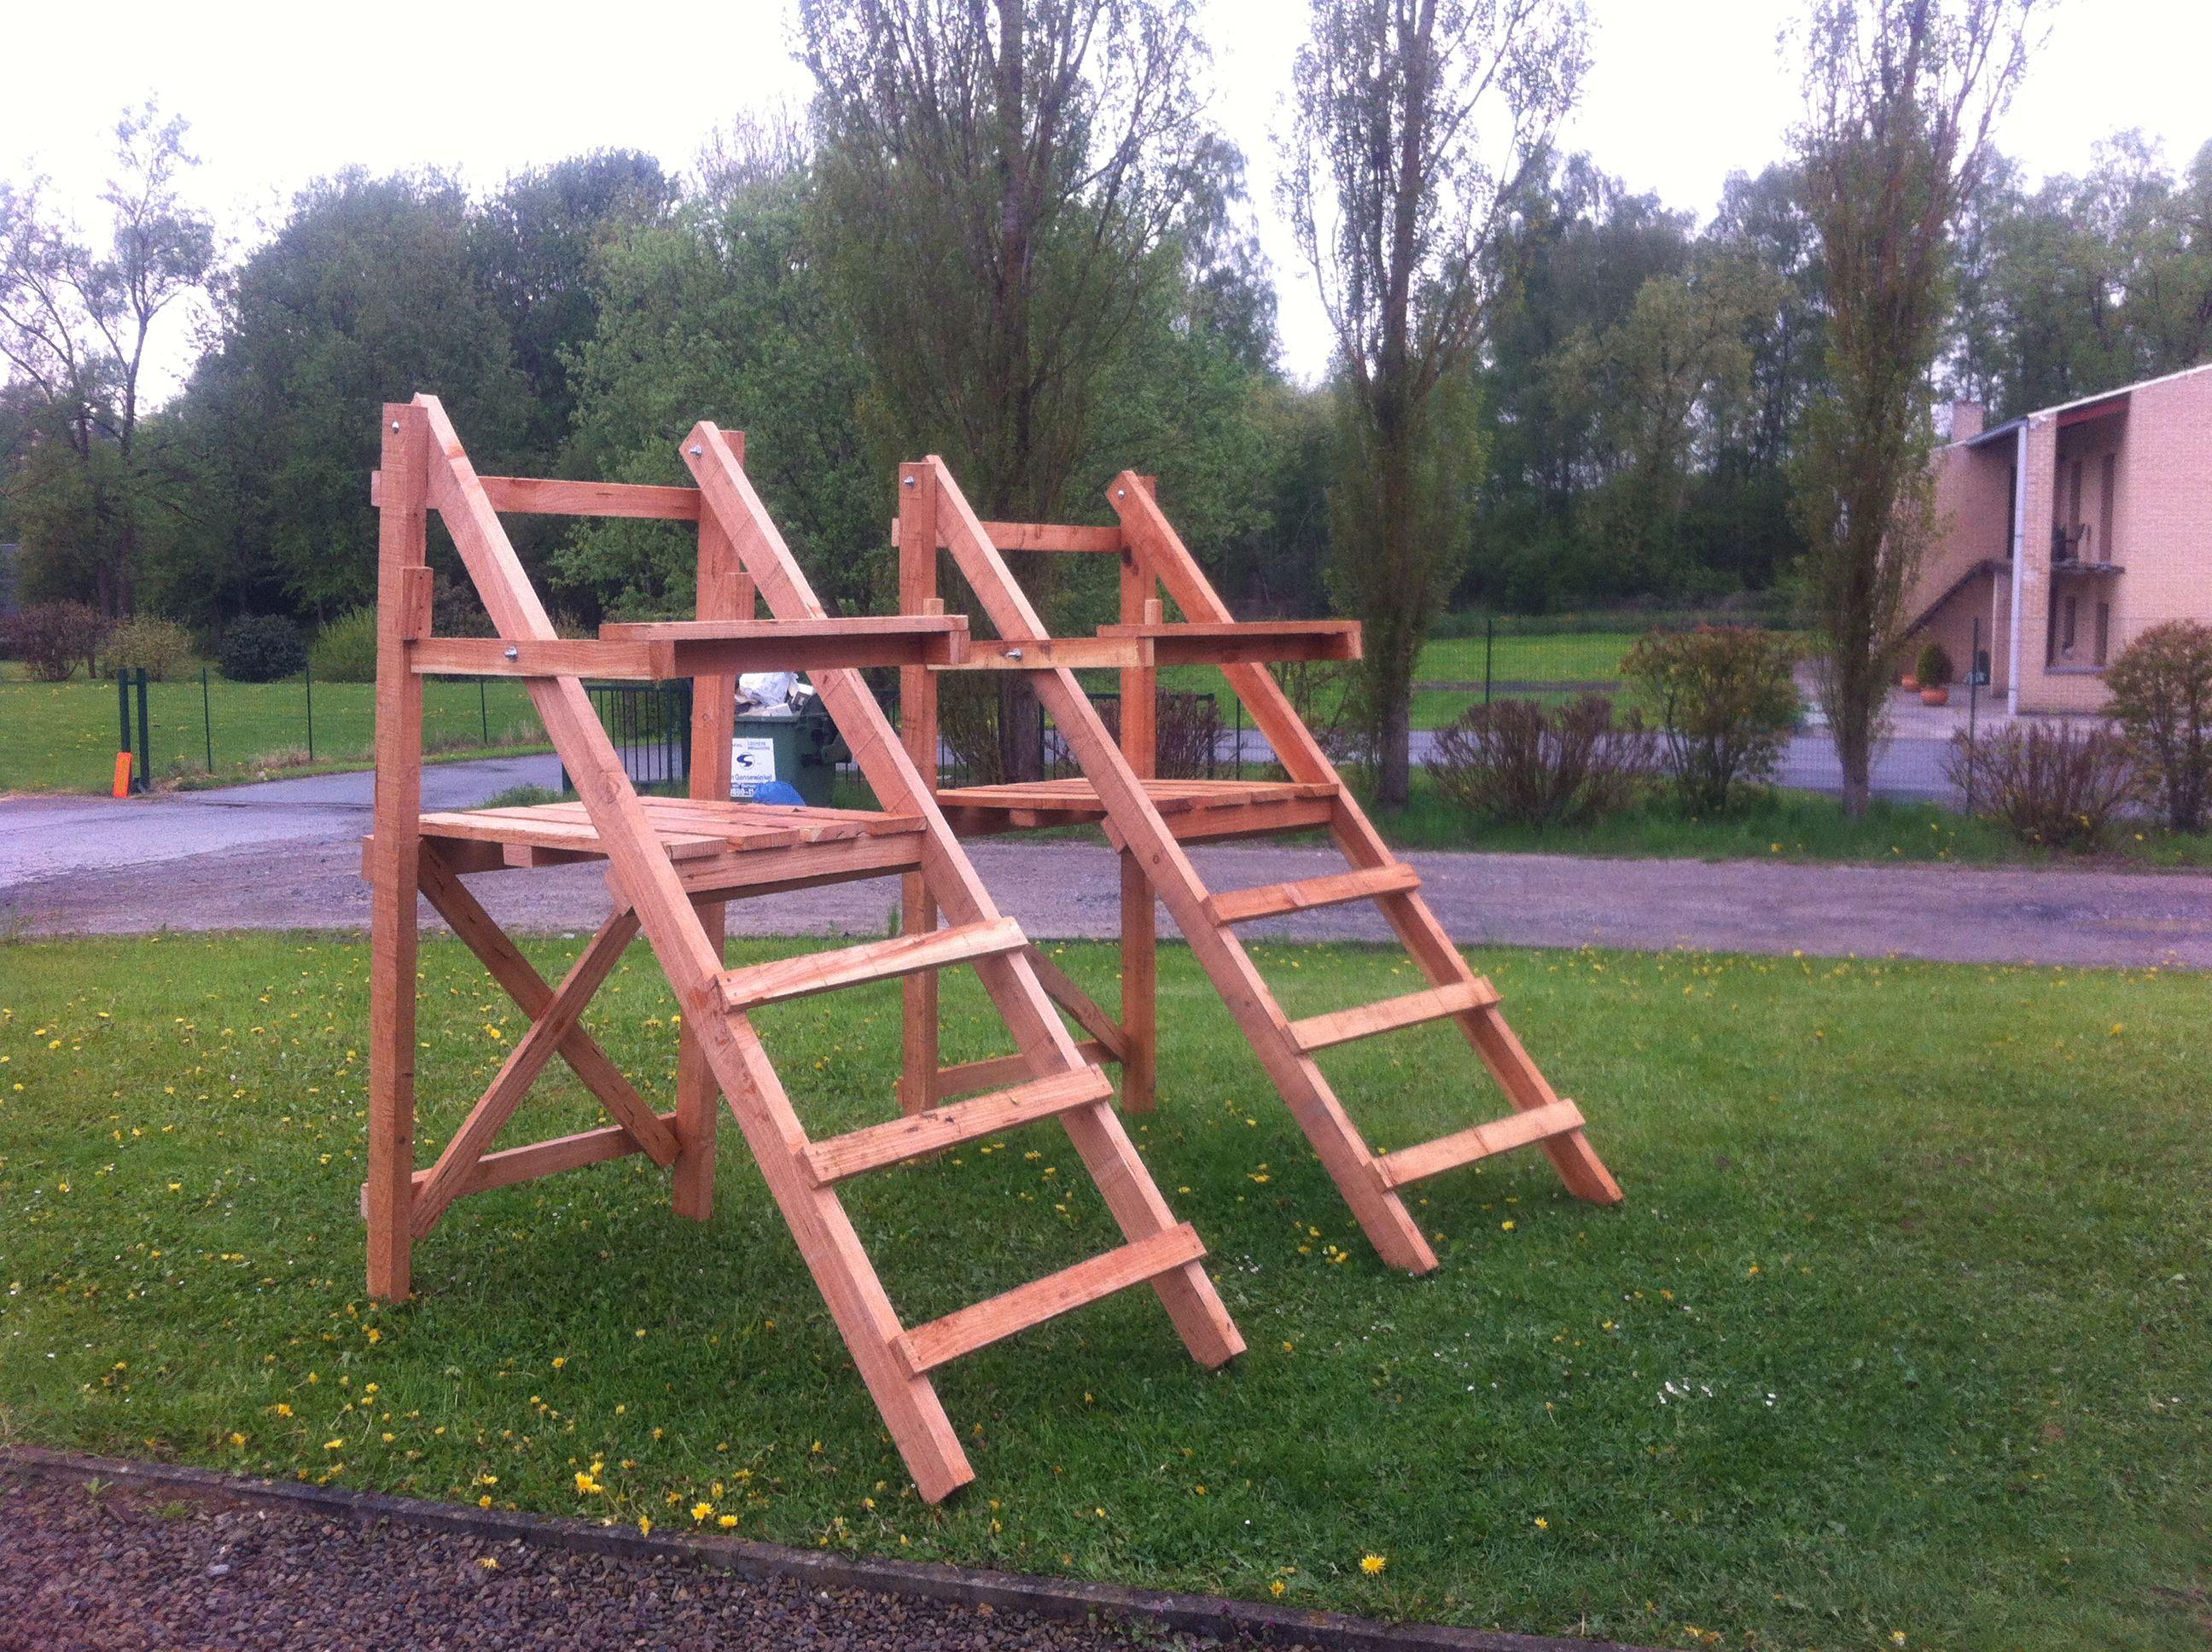 high chair deer stand gaming reviews xbox one mirador en douglas a 90  hauteur de plancher 1 50 las